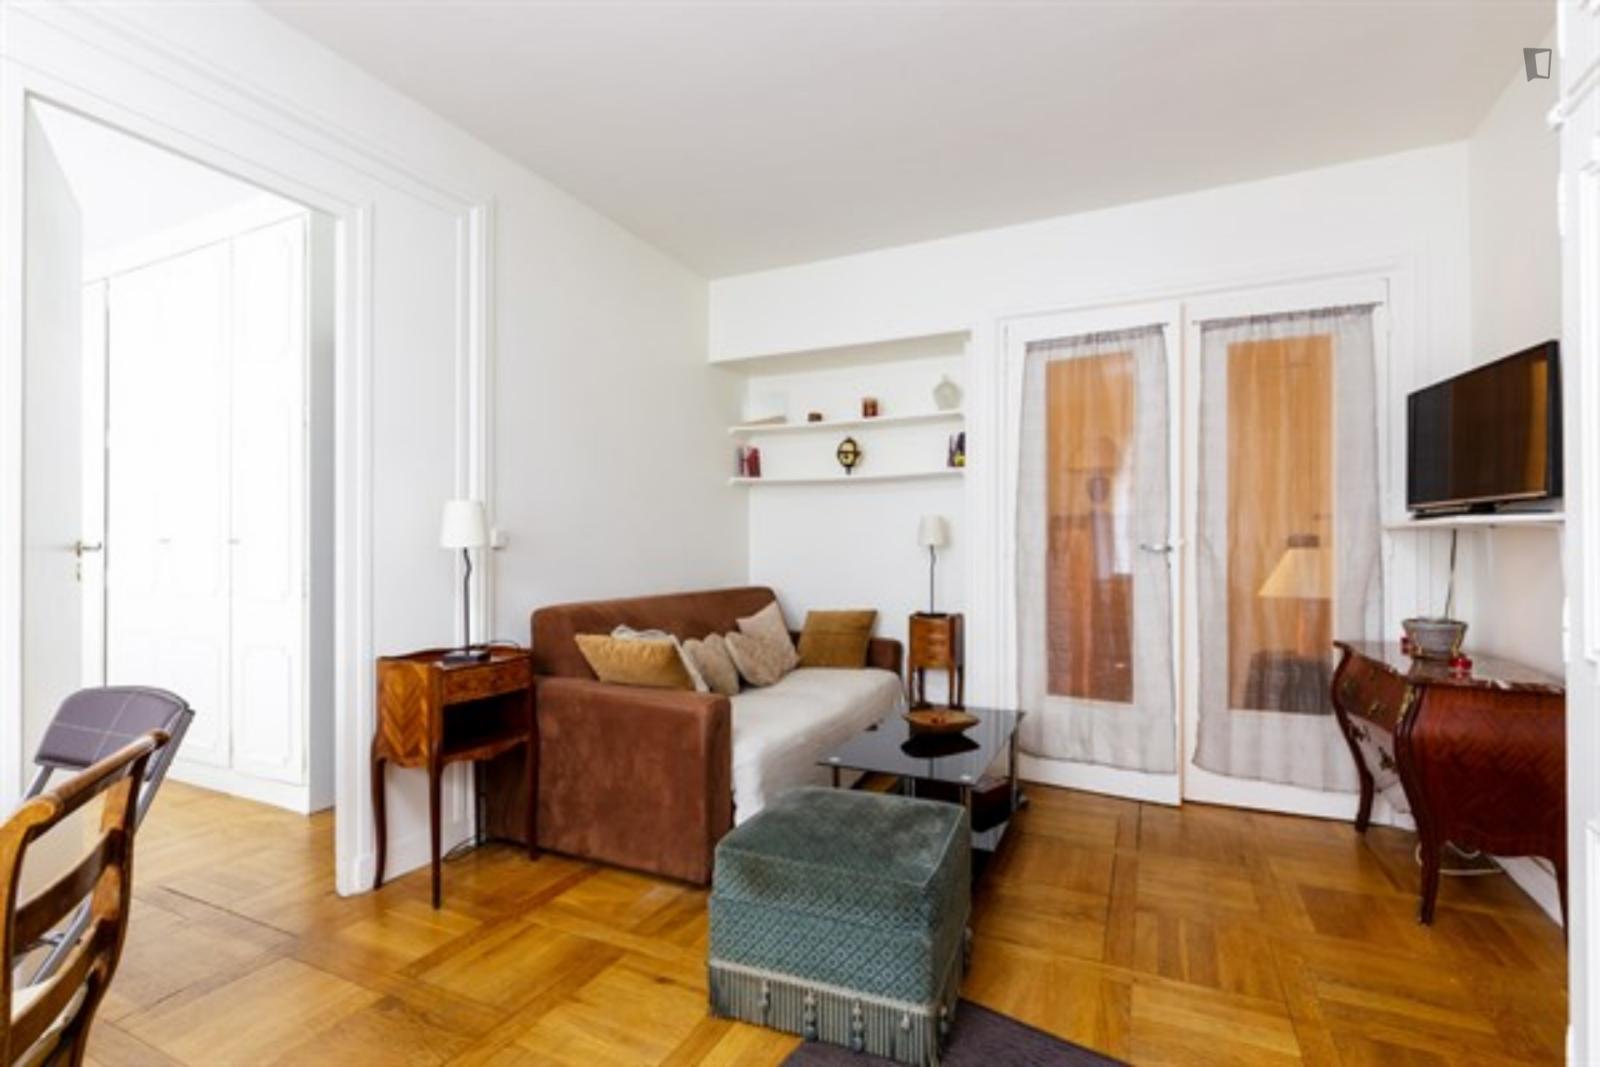 49 Rue Pergolèse, 16th arrondissement of Paris, FR-75 - 1,500 EUR/ month